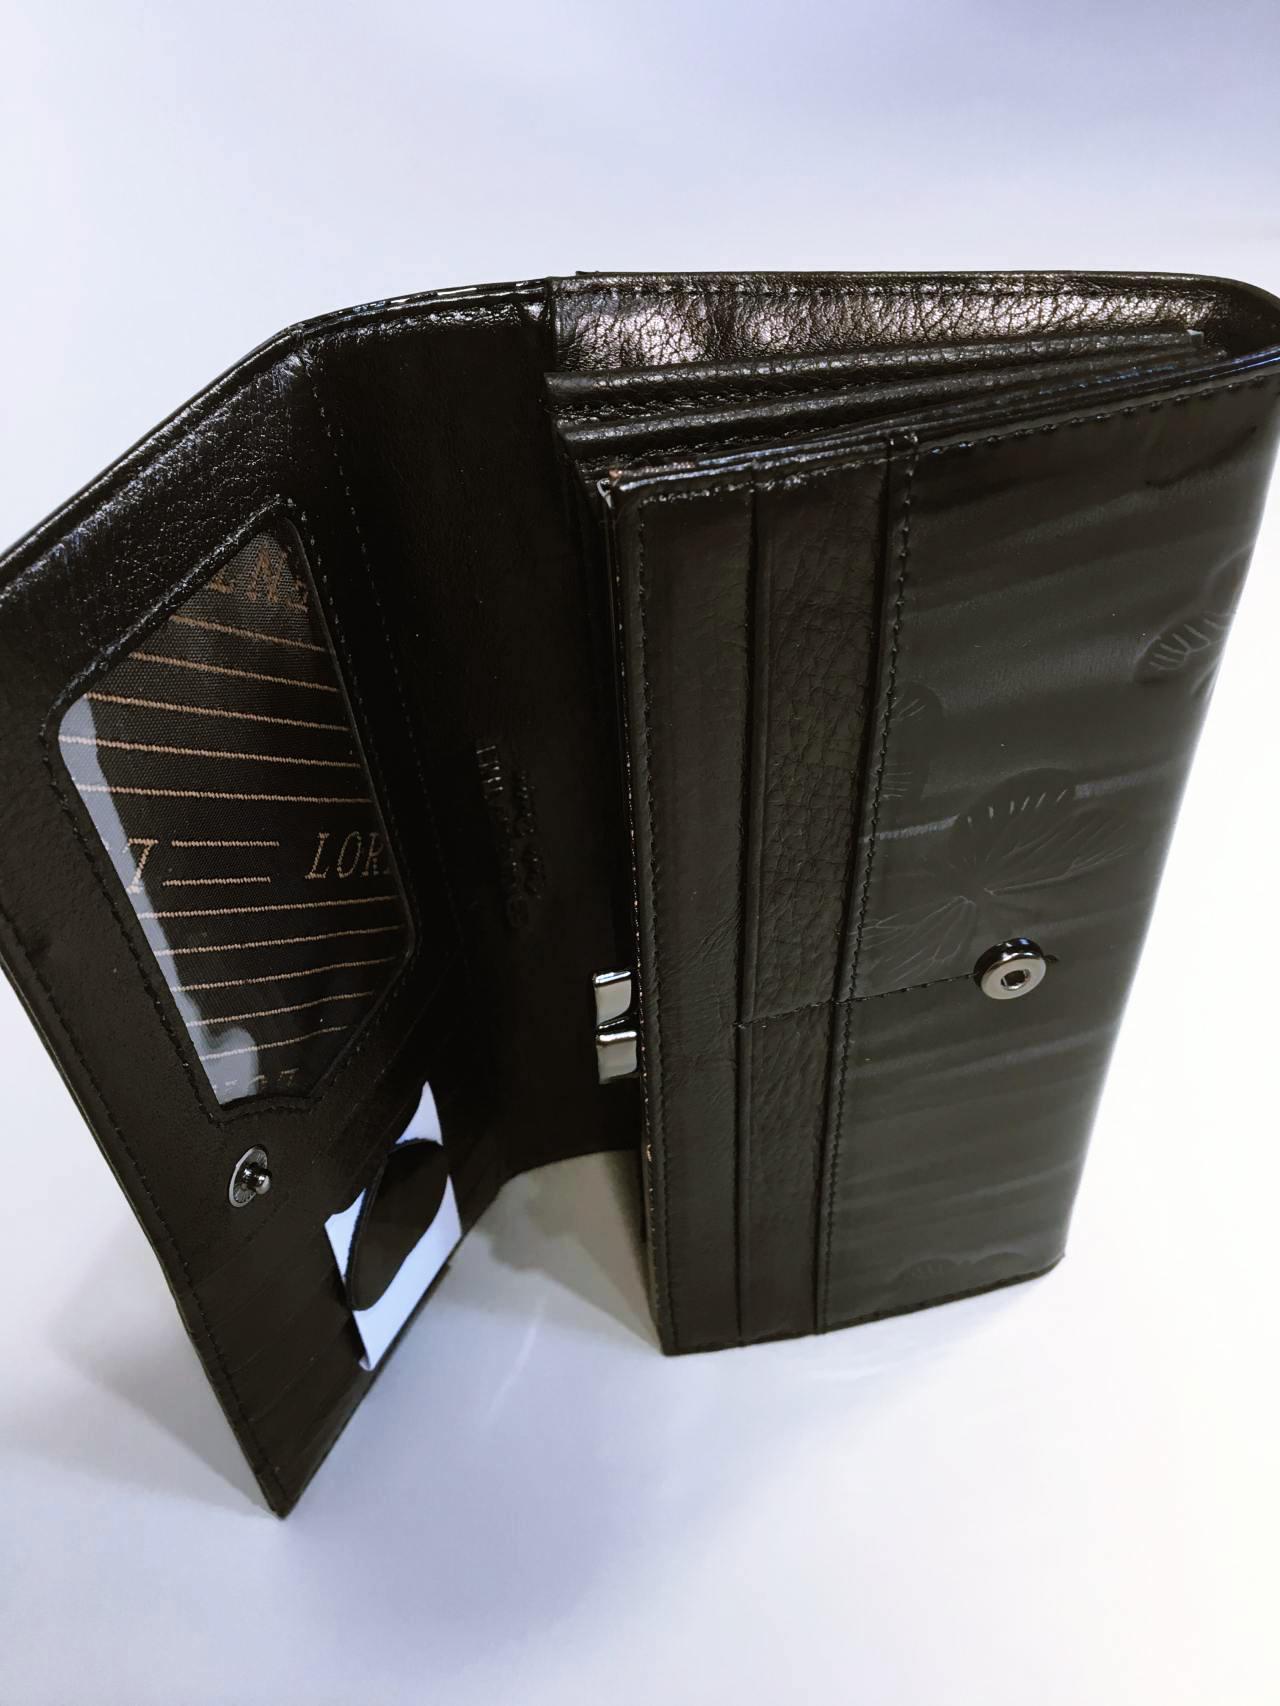 Kožená peněženka Lorenti černo šedá lesklá 05